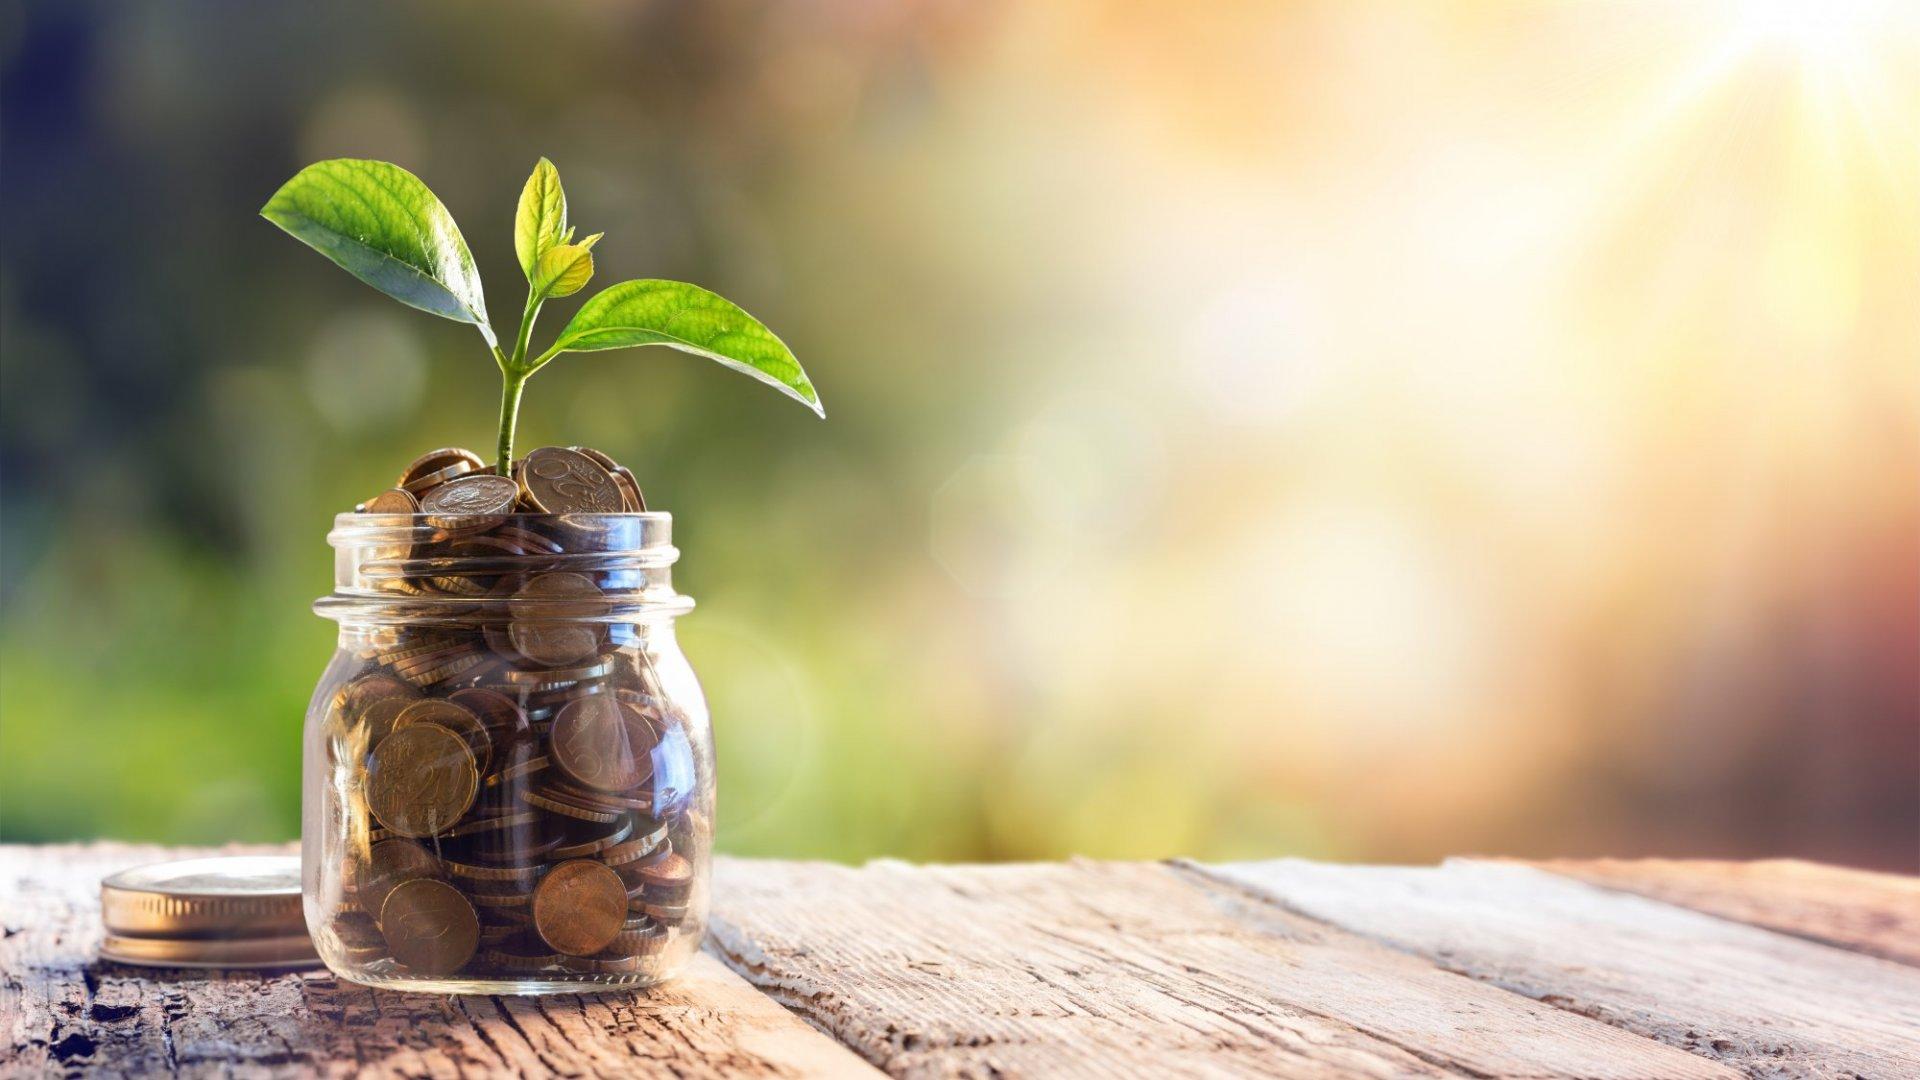 4 Simple Ways To Win This Math Genius Venture Capitalist's Money